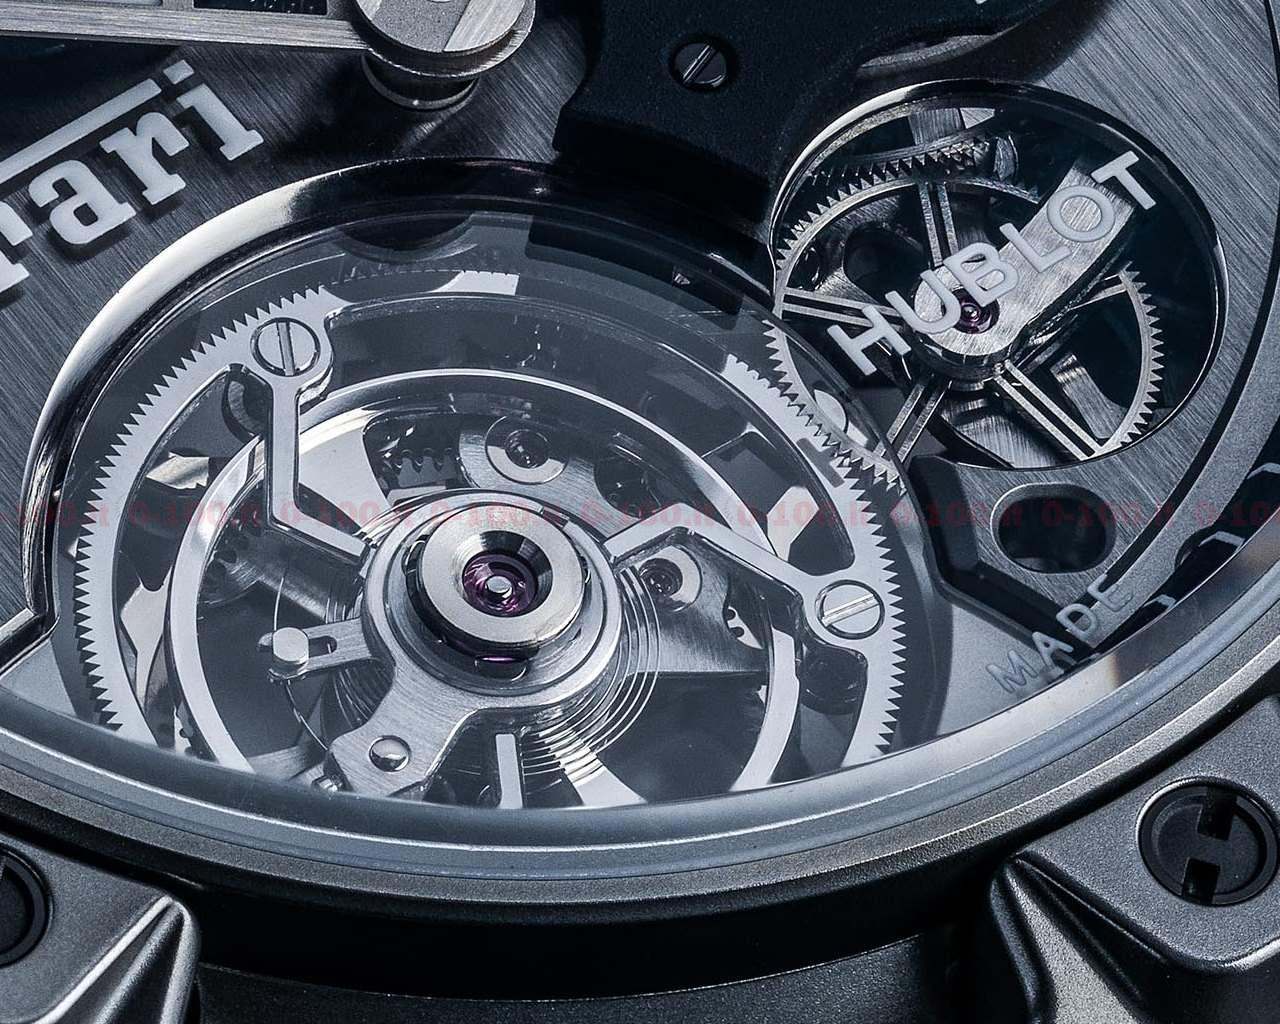 Hublot Techframe Ferrari 70 Years Tourbillon Chronograph Limited Edition_prezzo_price_0-10016